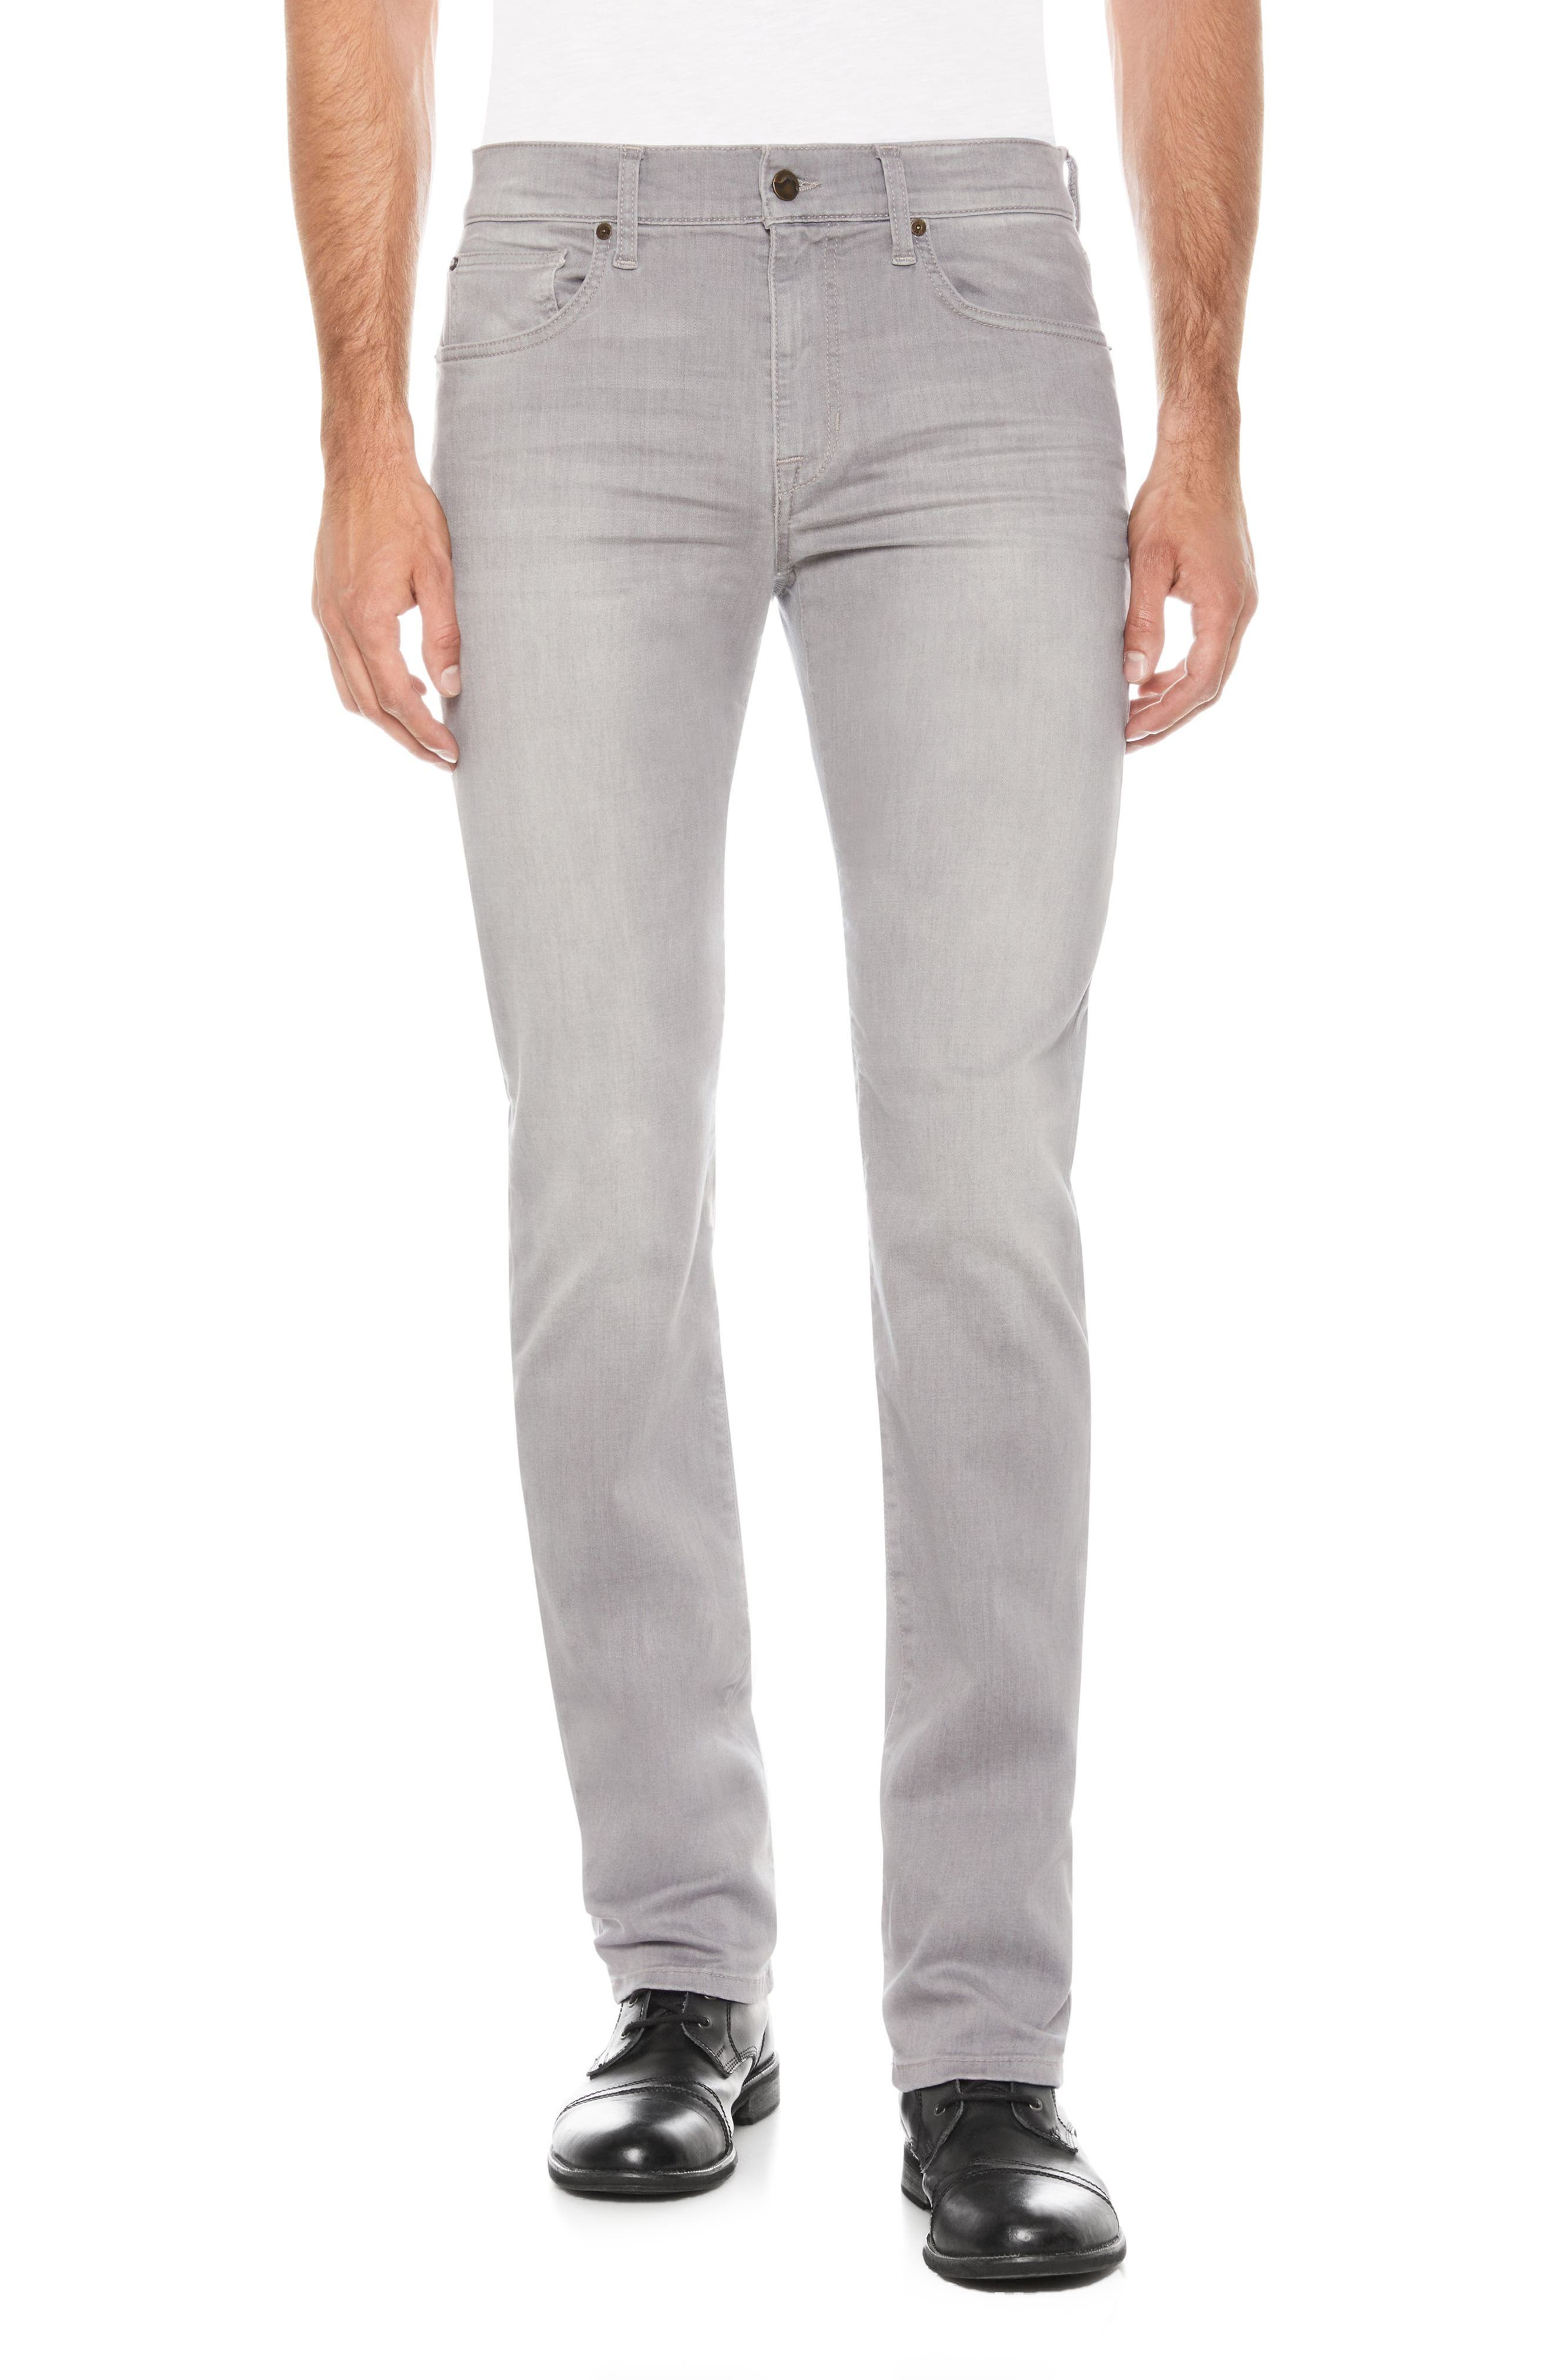 Brixton Slim Straight Fit Jeans,                         Main,                         color, 050